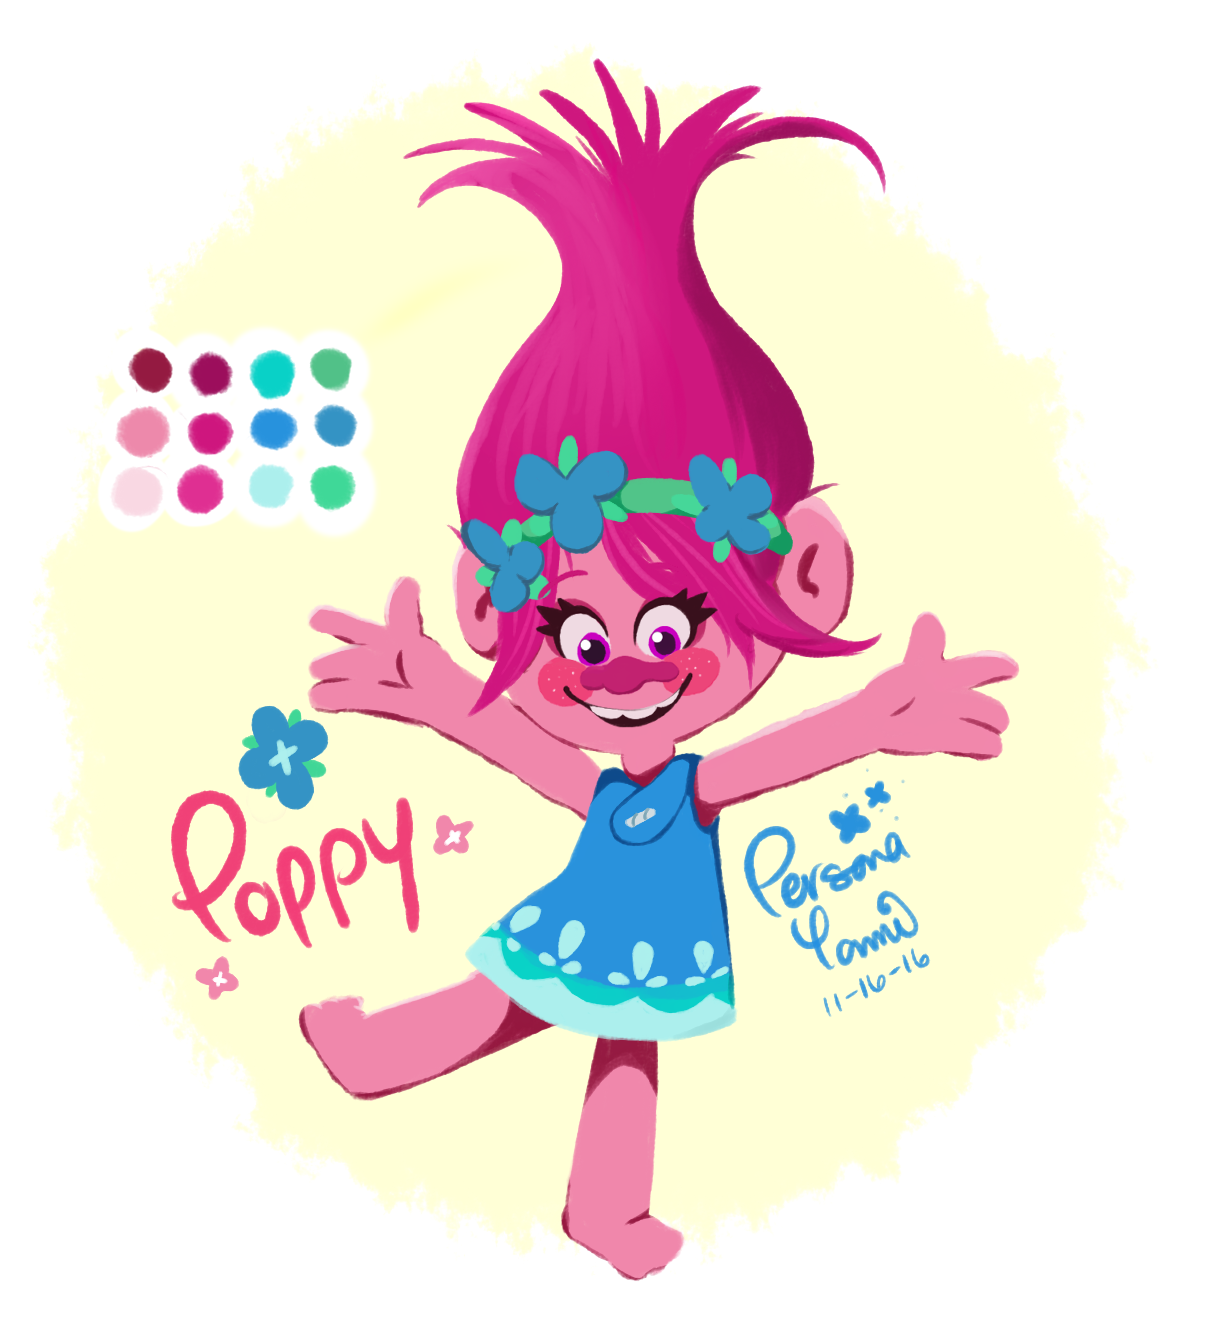 Happy Poppy